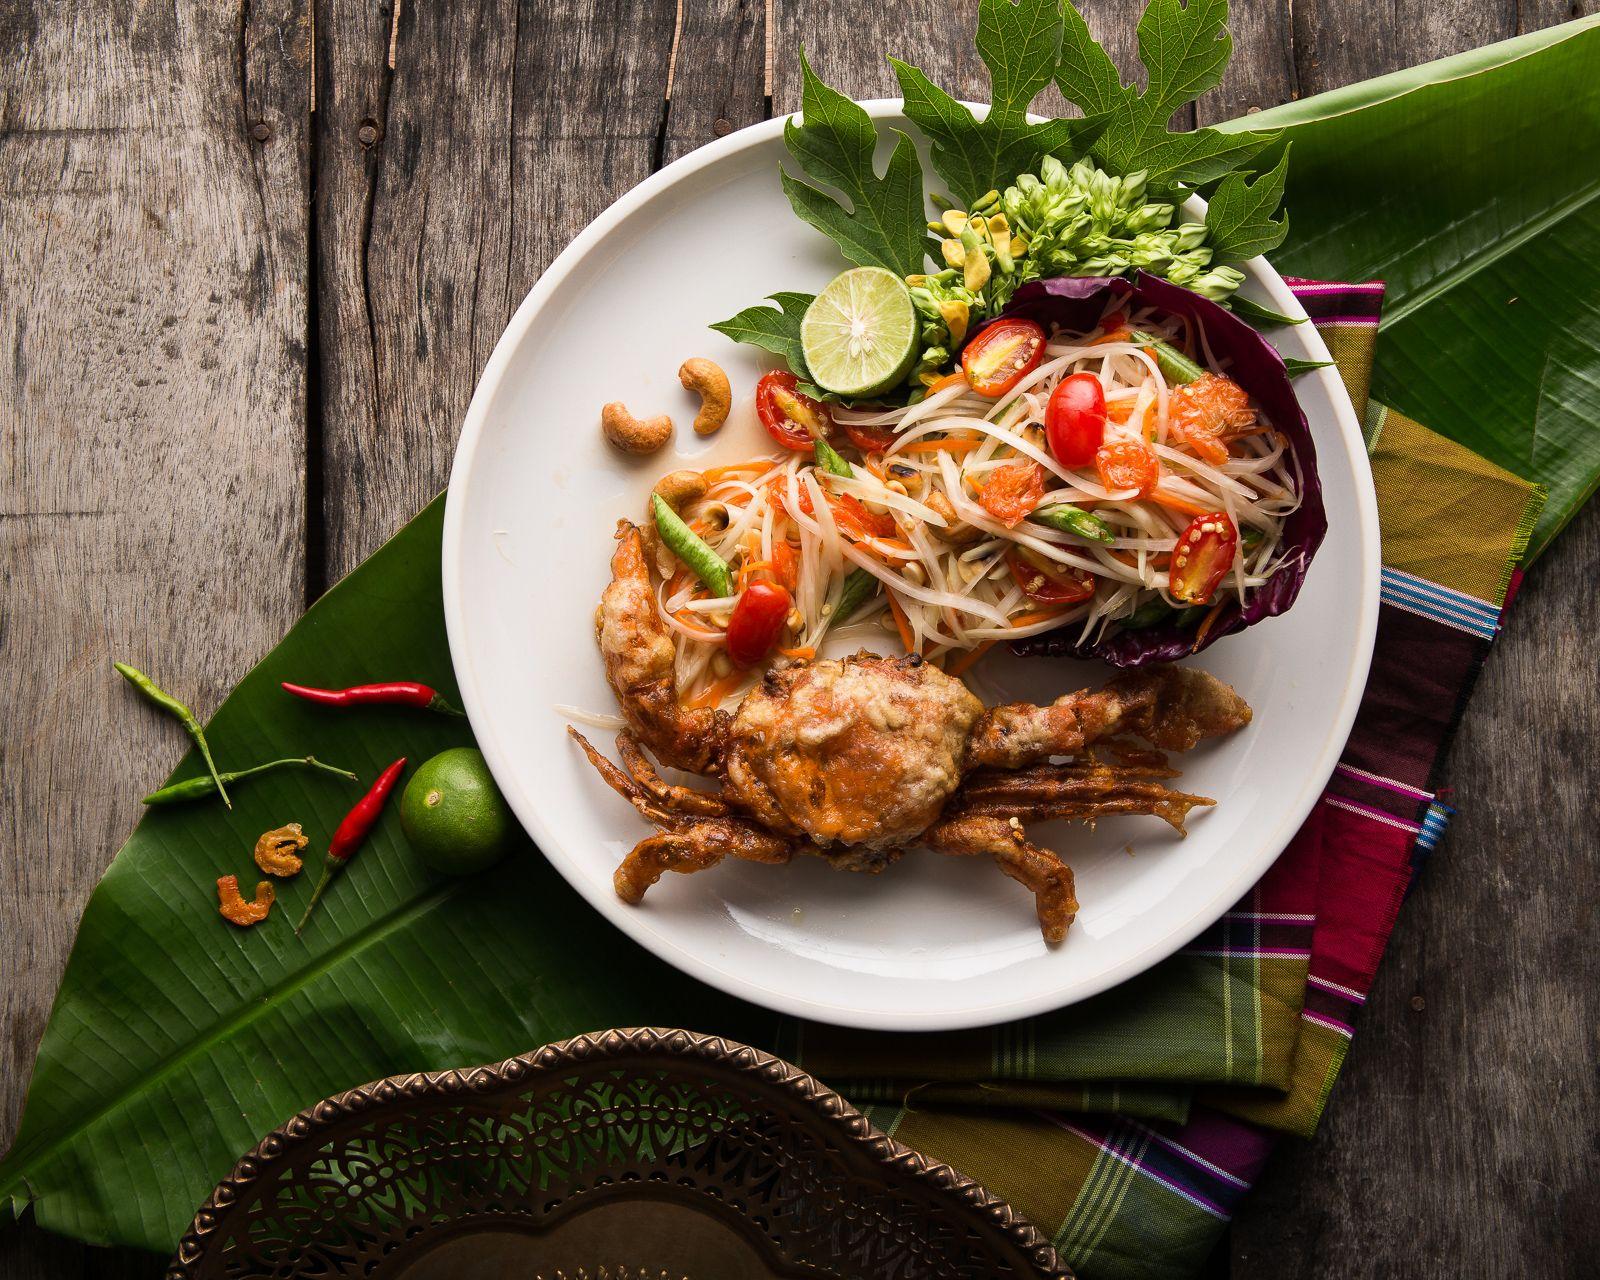 Amazing Asian Food Presentation Ideas